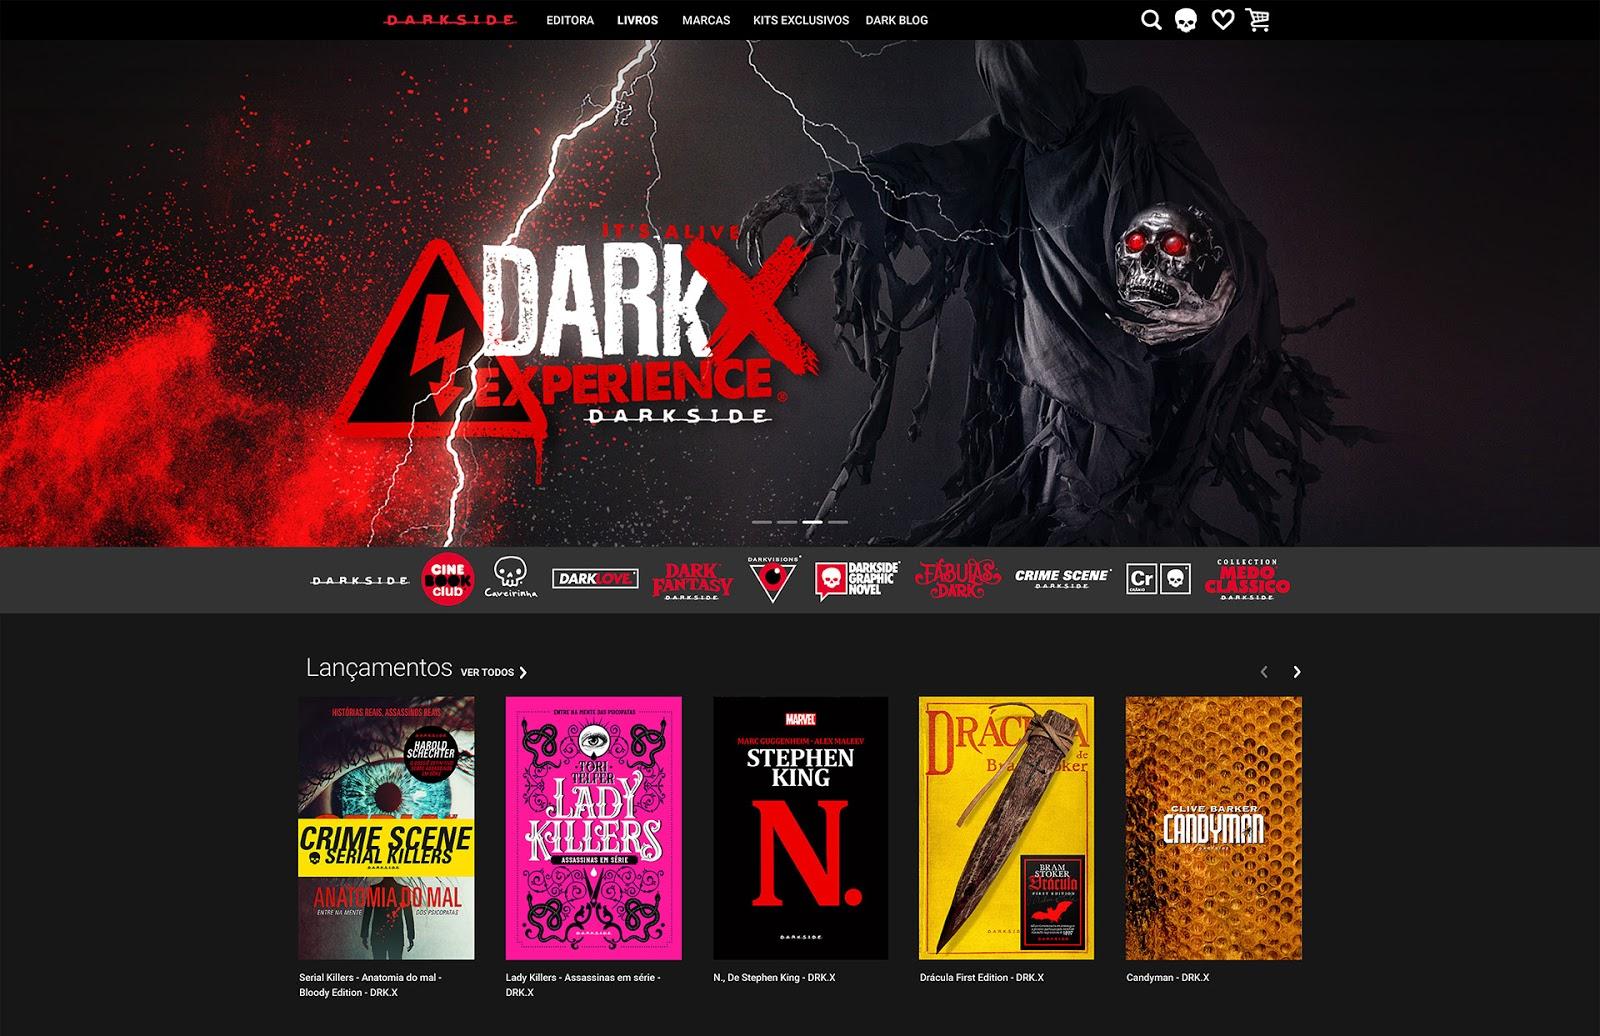 DarkSide® Books inaugura loja virtual para transformar a experiência de  compra  www.darksidebooks.com.br c7ce4cfaeabc0